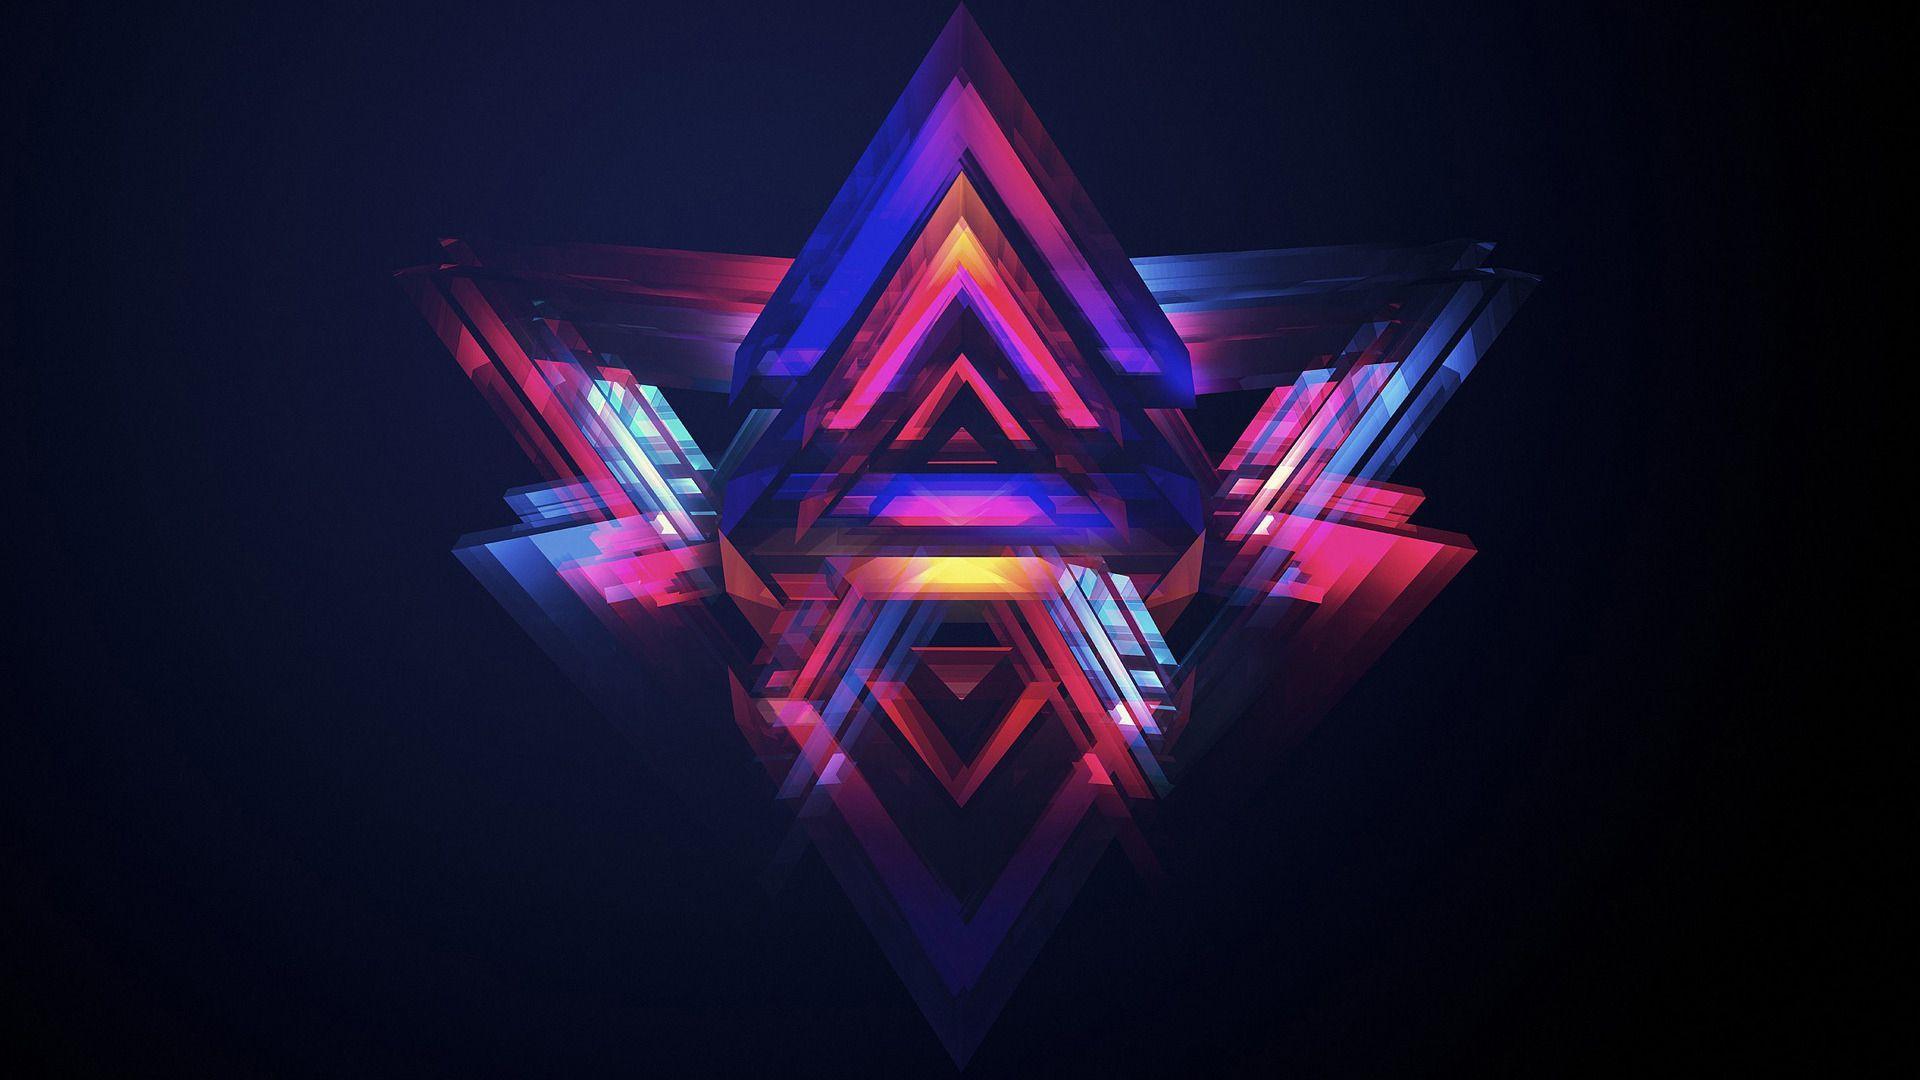 Cool Illuminati Wallpapers Top Free Cool Illuminati